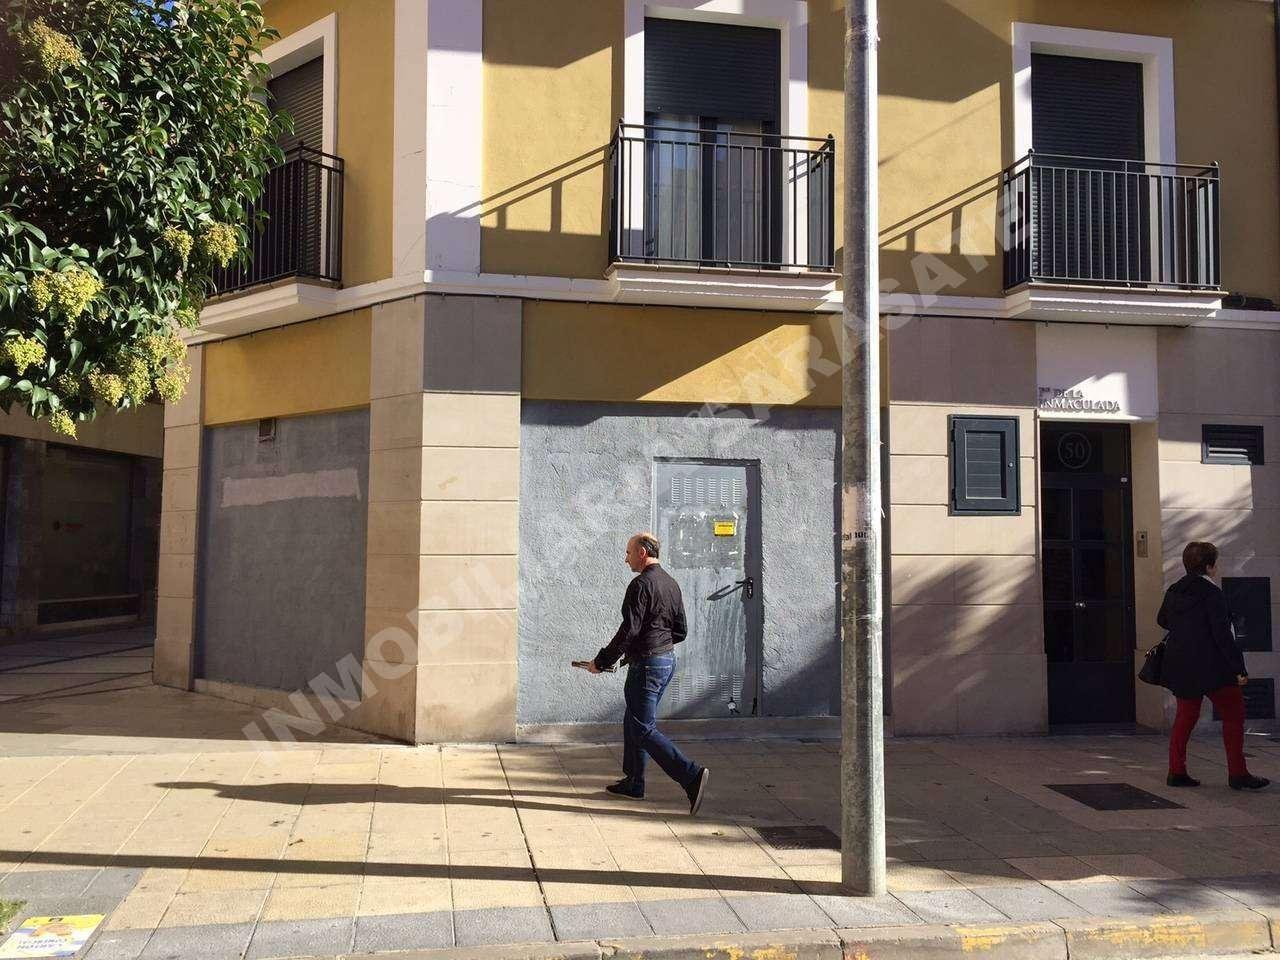 ALQUILER DE LOCAL COMERCIAL EN CALLE PASEO INMACULADA, ESTELLA-LIZARRA | REF. (000504)